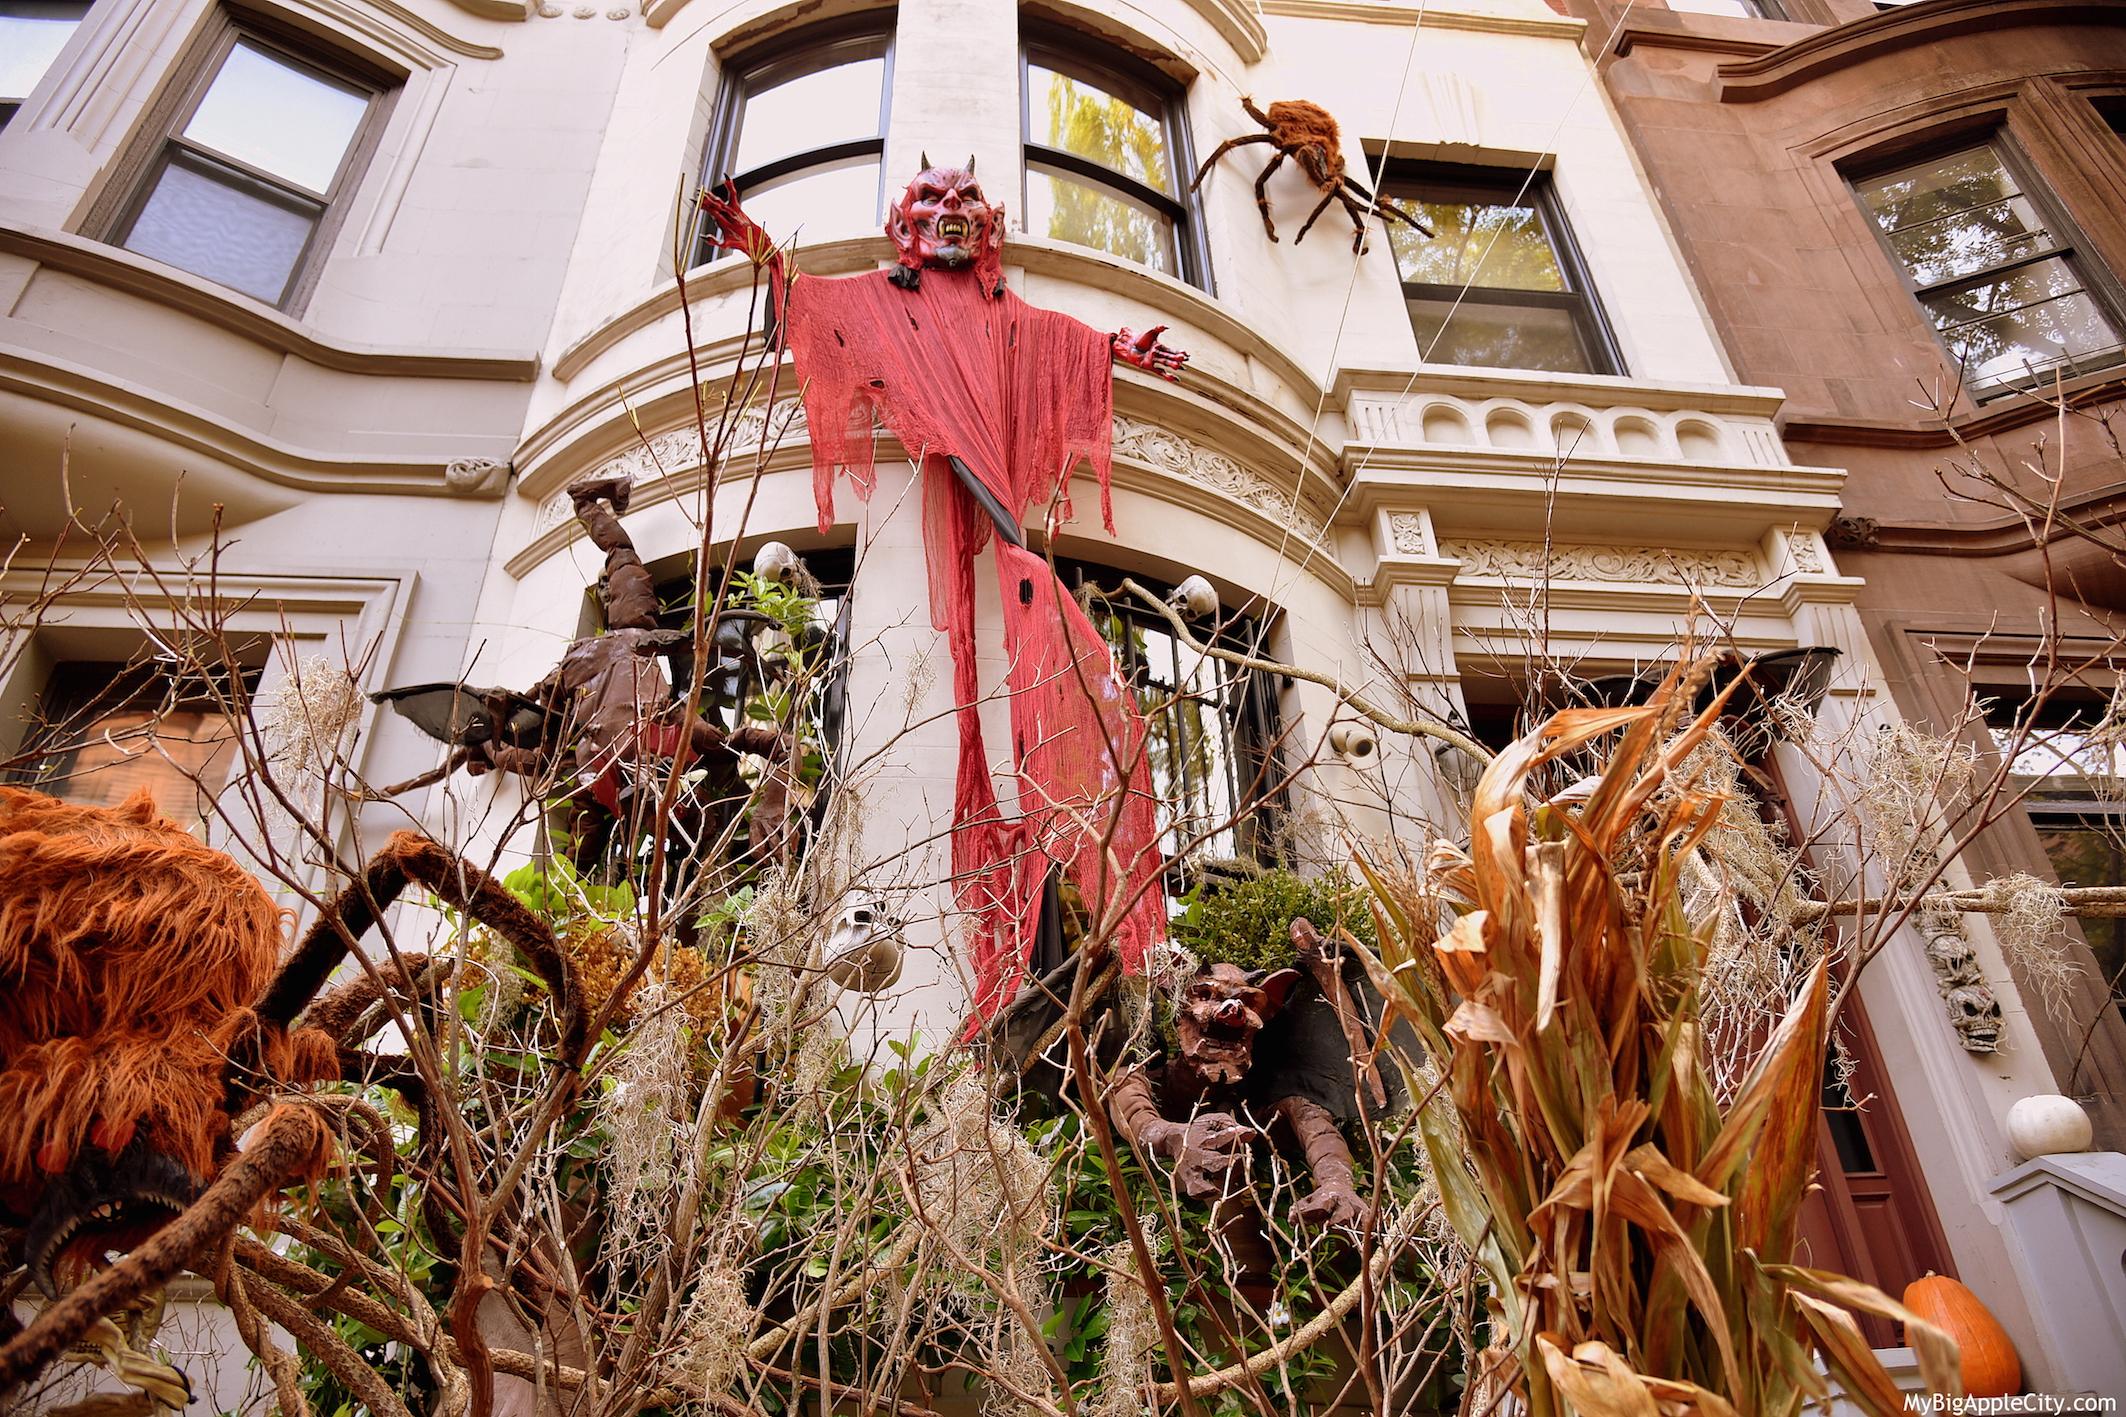 Haunted-house-manhattan-new-york-manhattan-2015-blog